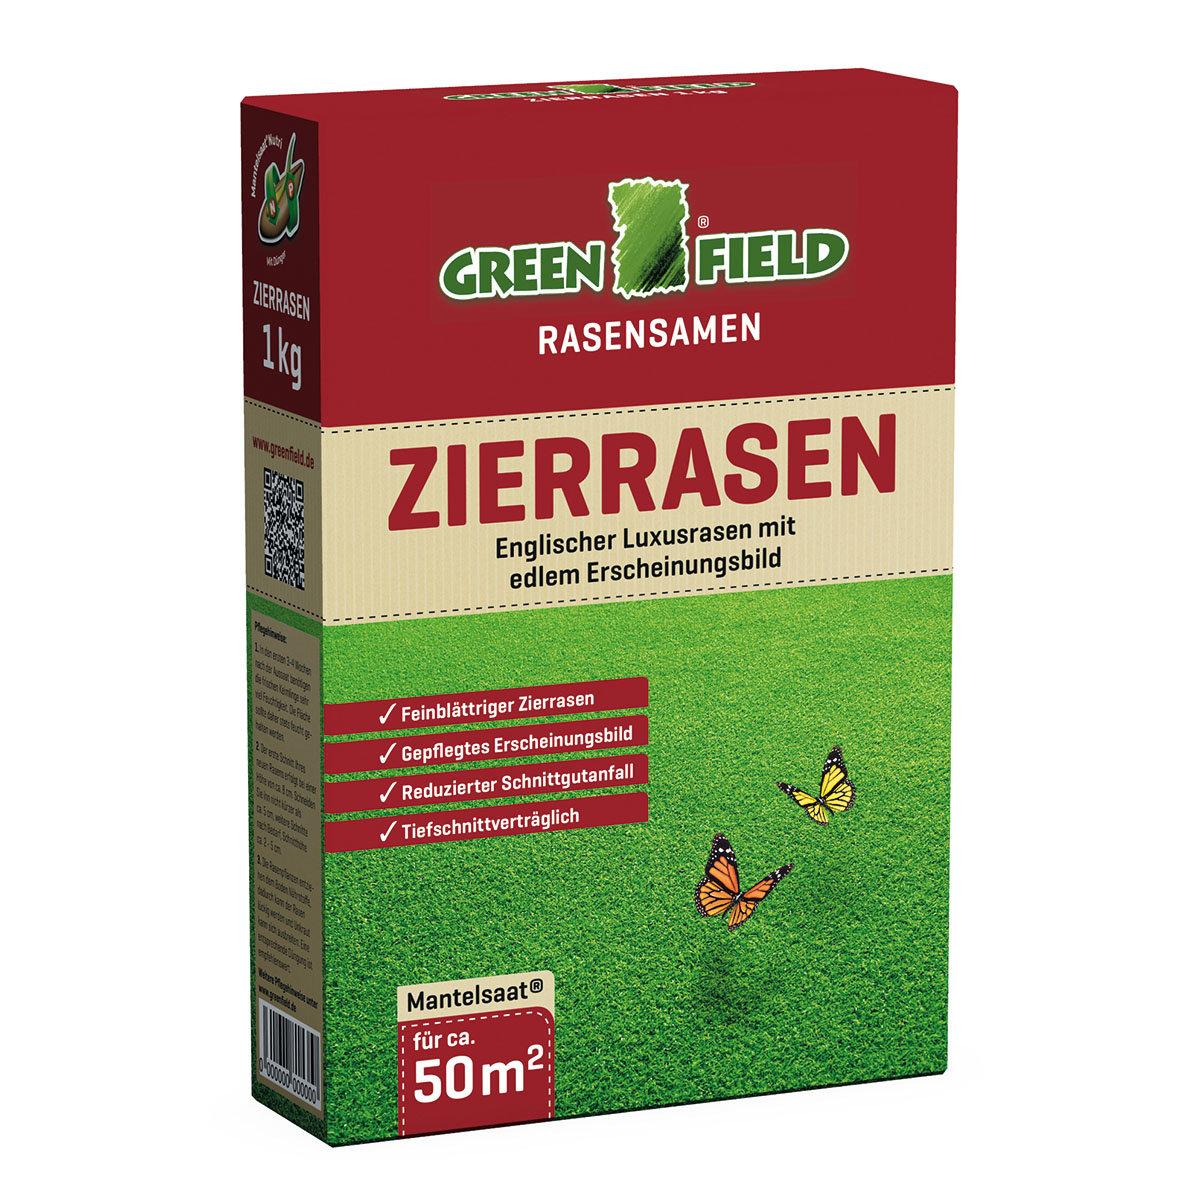 Greenfield Zierrasensamen, 1 kg